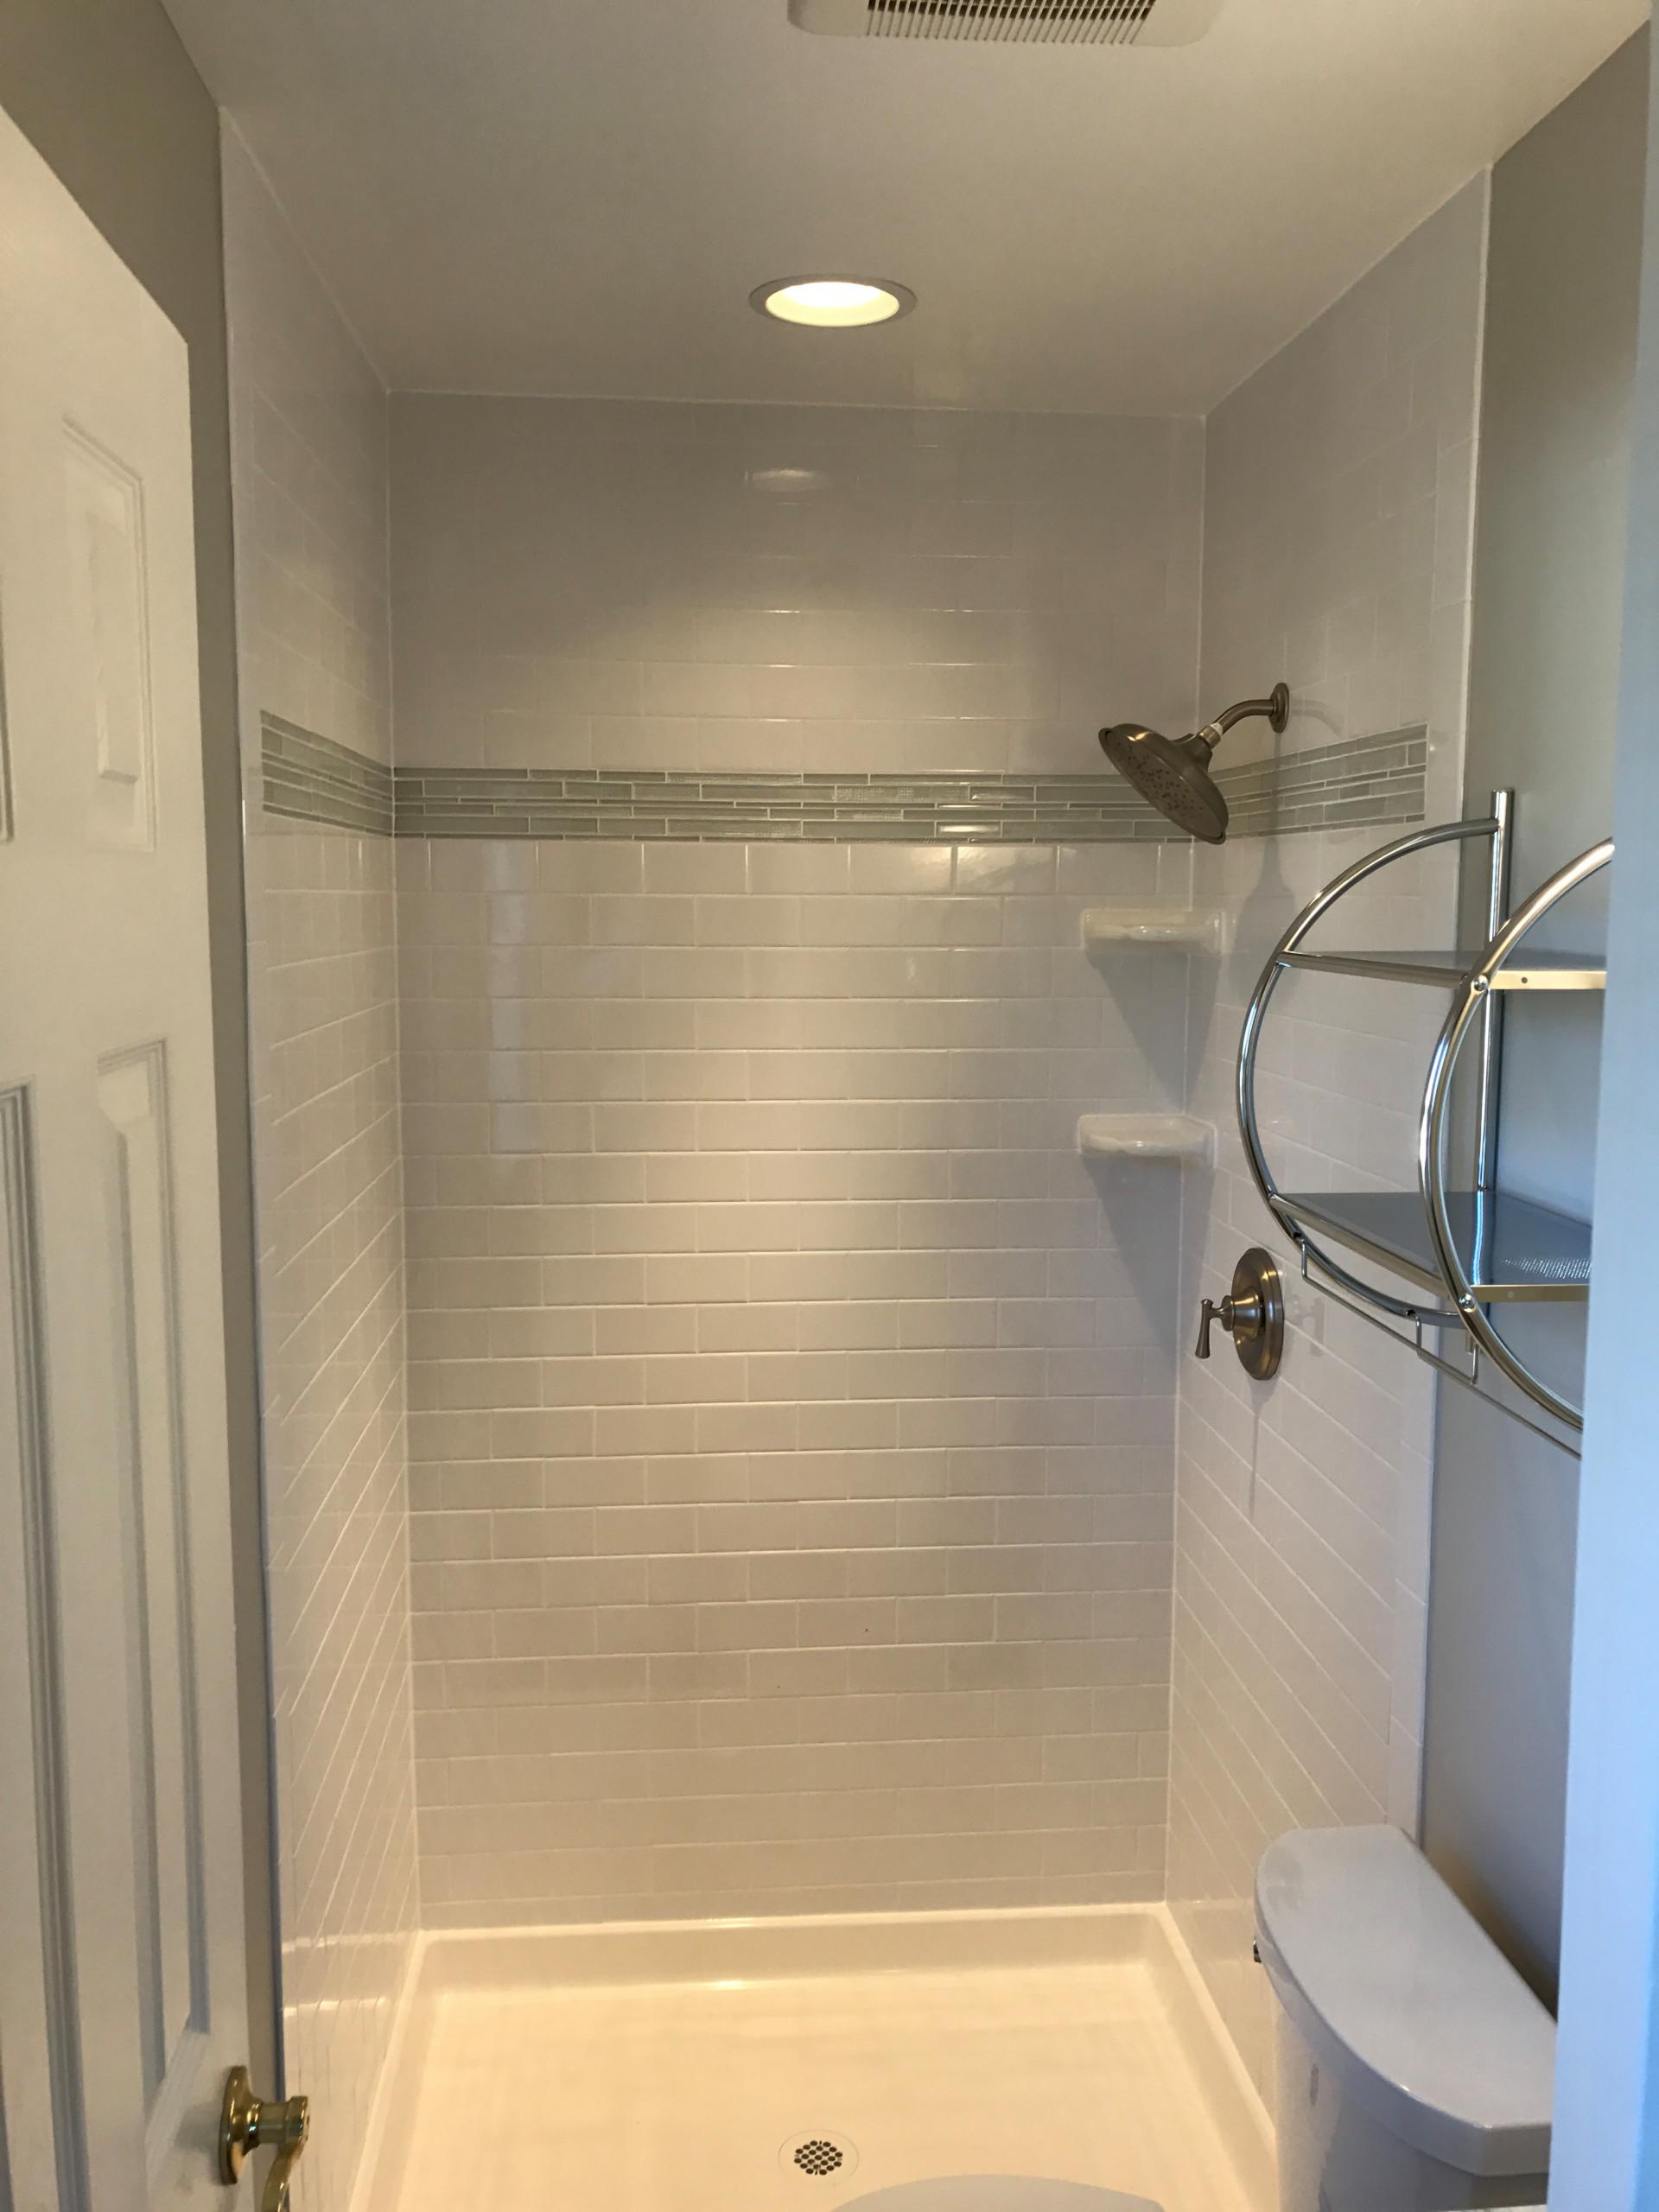 Cape St. Clair Bathroom Remodel